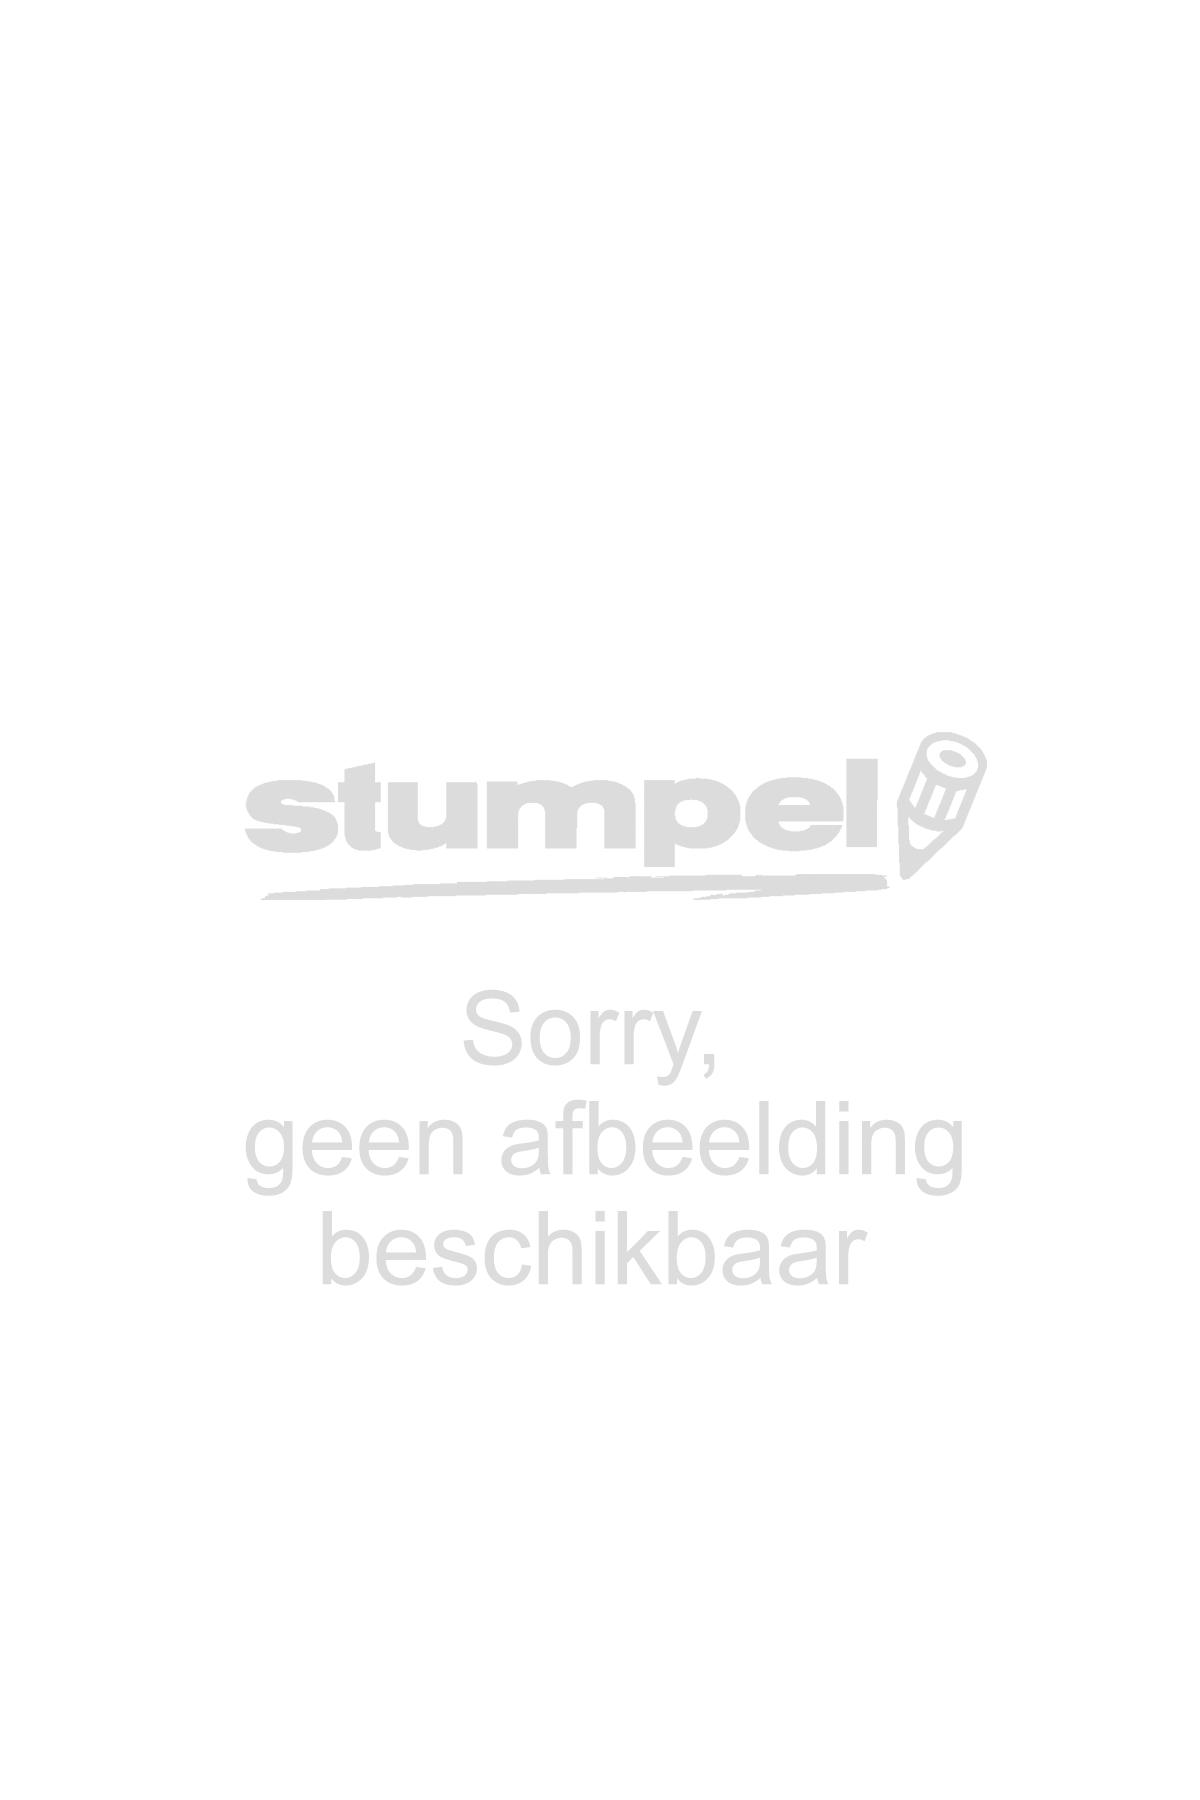 potlood-bruynzeel-1605-hb-640307